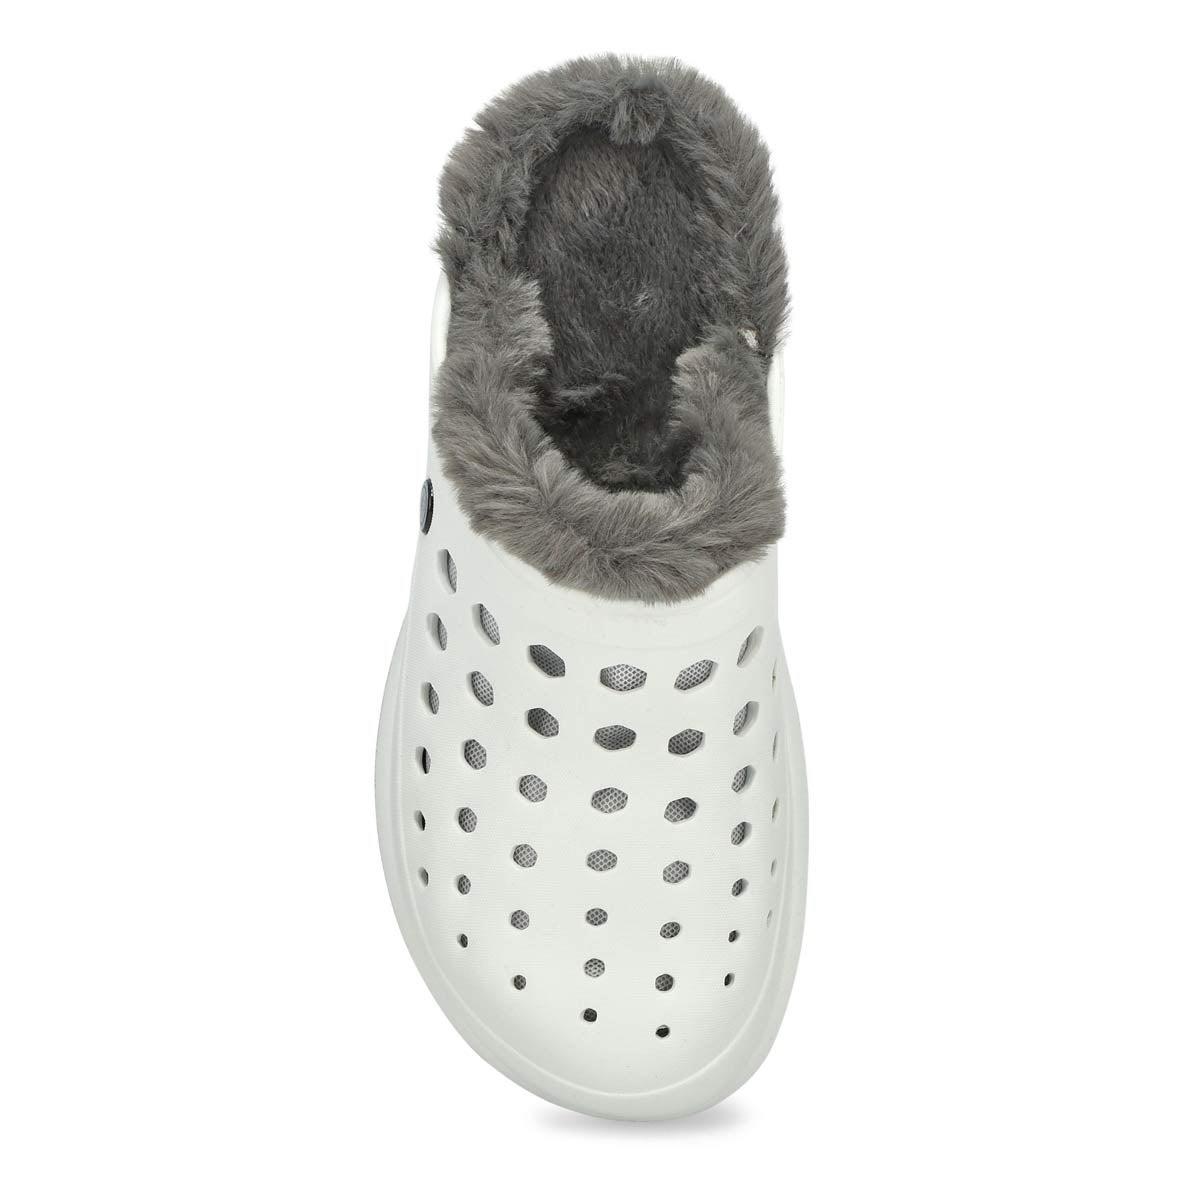 Unisex Uaslp Comfort Clog - White/Charcoal